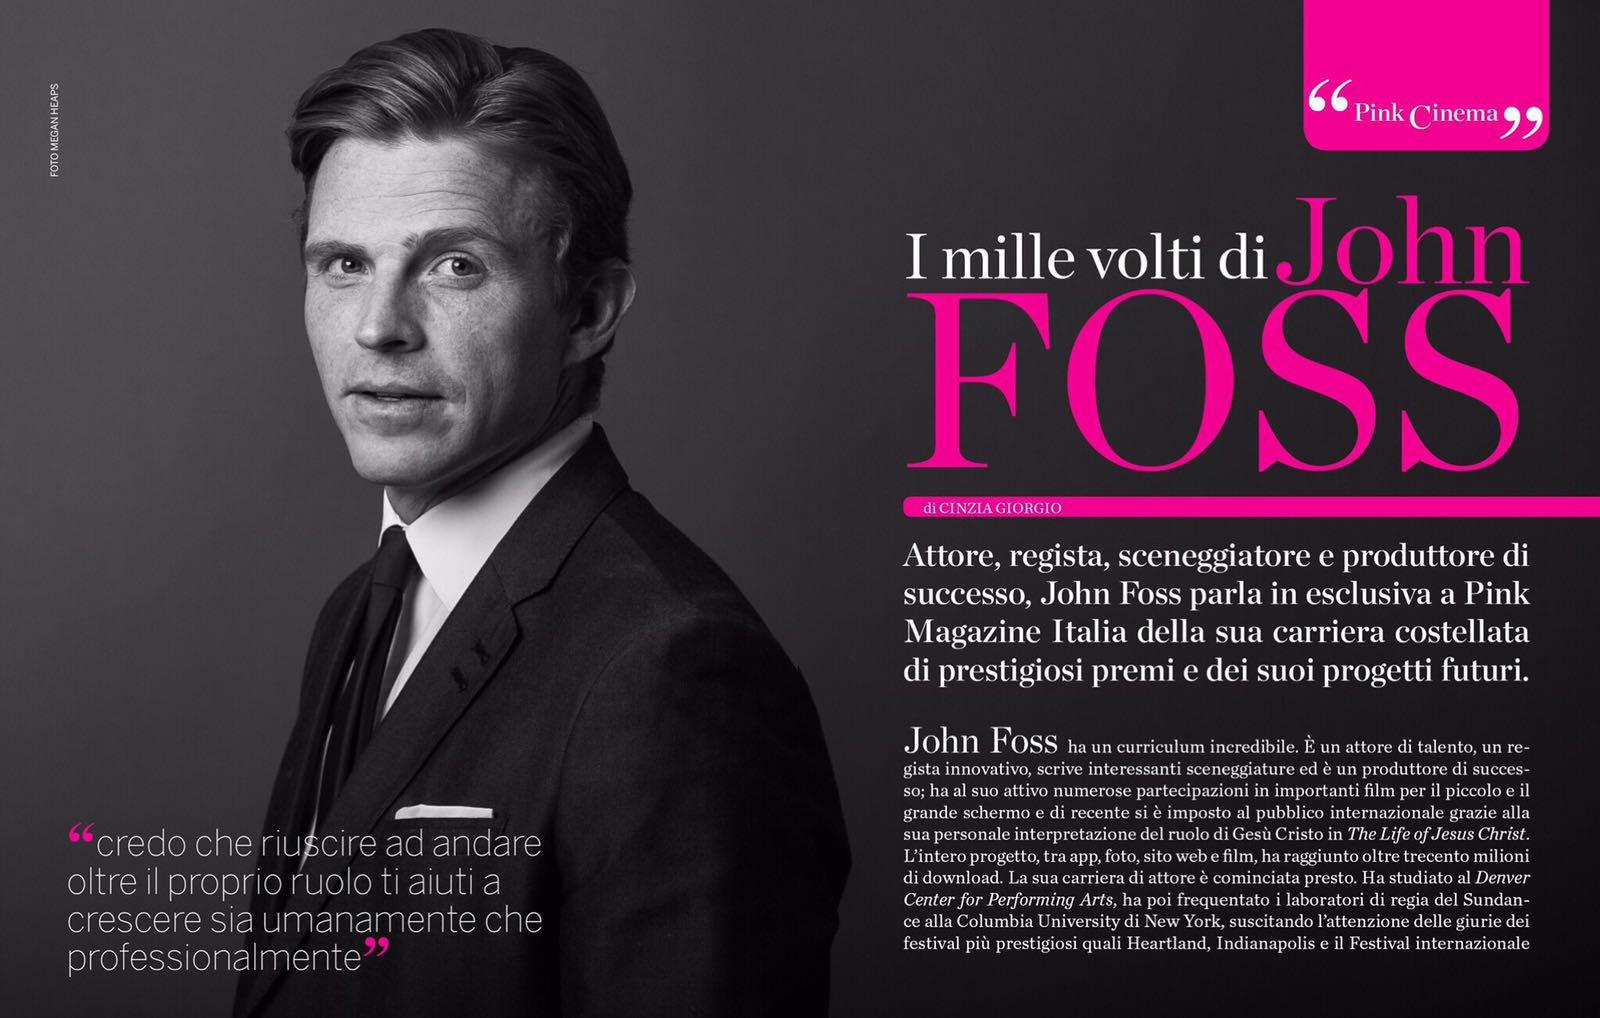 JOHN FOSS MAG.JPG